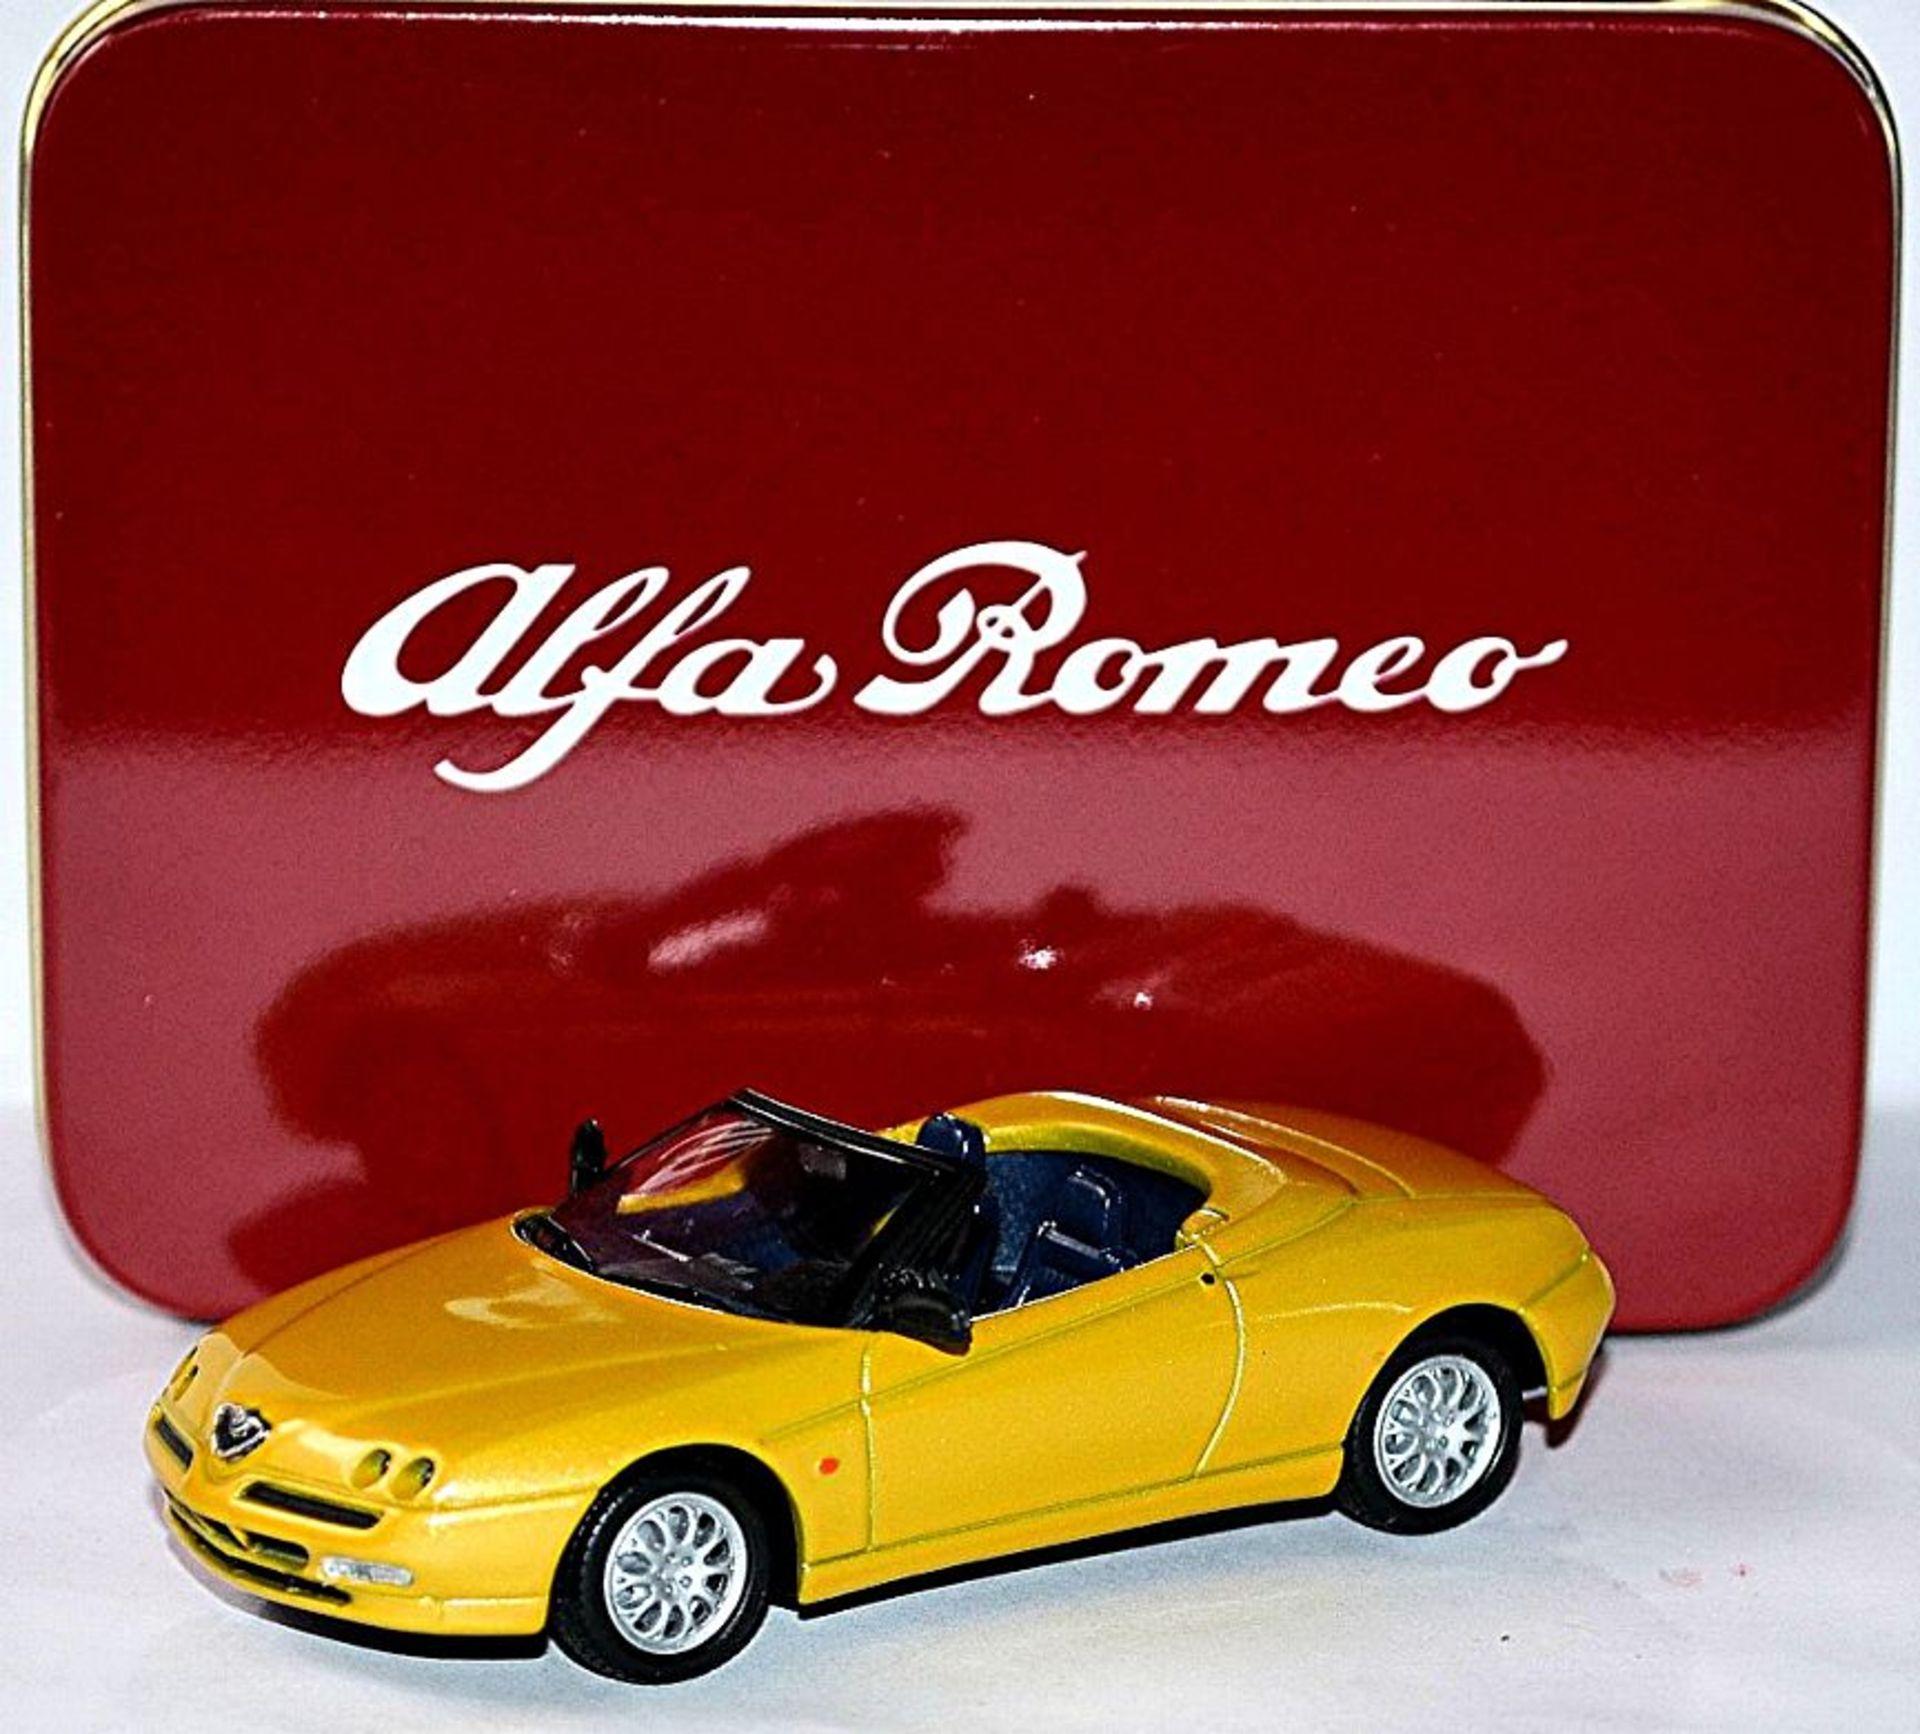 Lot 10378 - V Brand New 1/43 Diecast Model 4655 - 1995 Alfa Romeo Spider - eBay Price £15.99